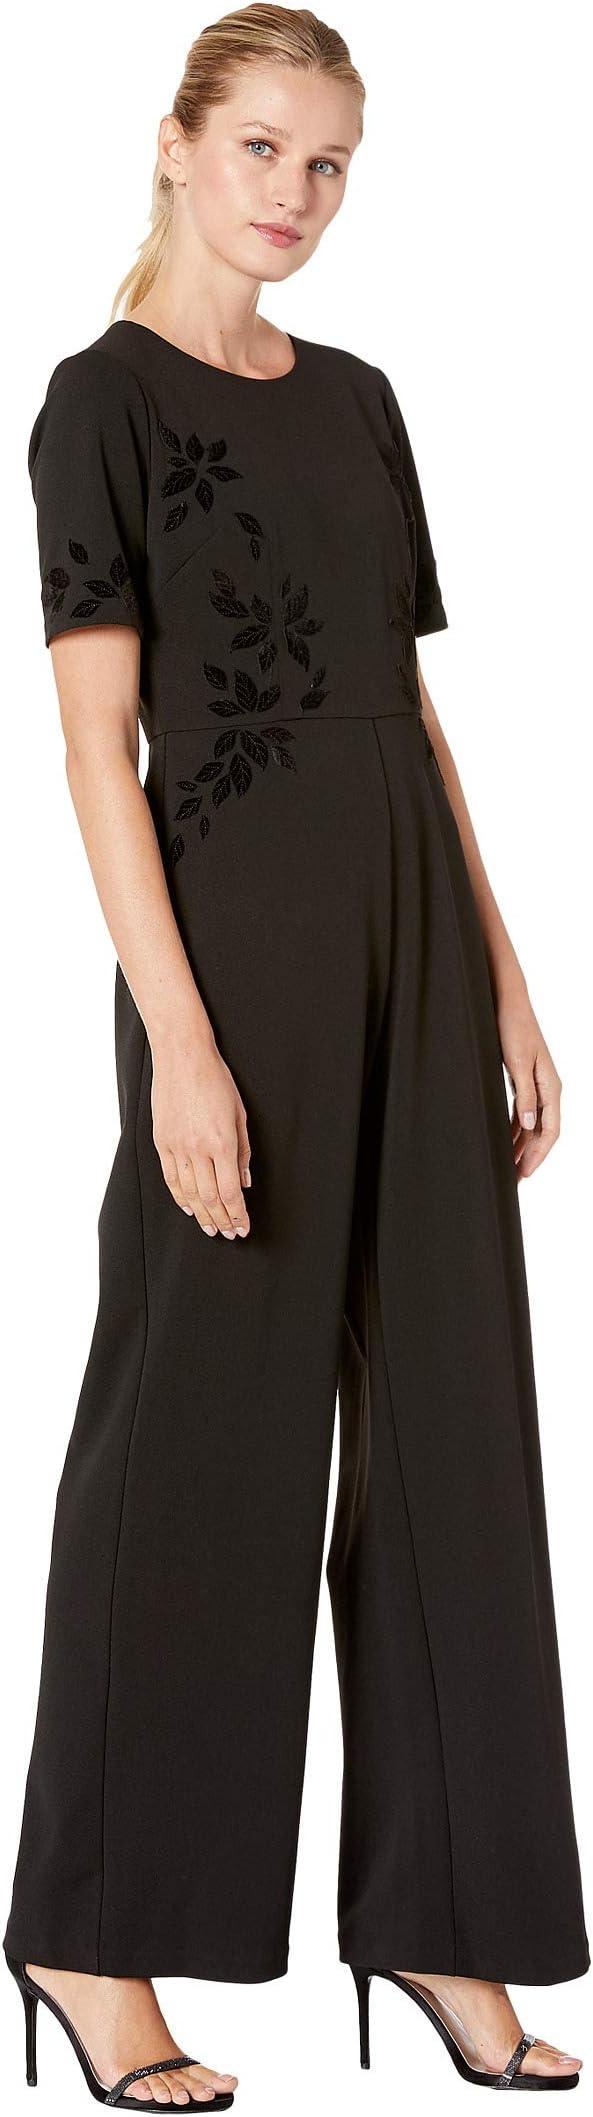 Adrianna Papell Velvet Applique Crepe Jumpsuit